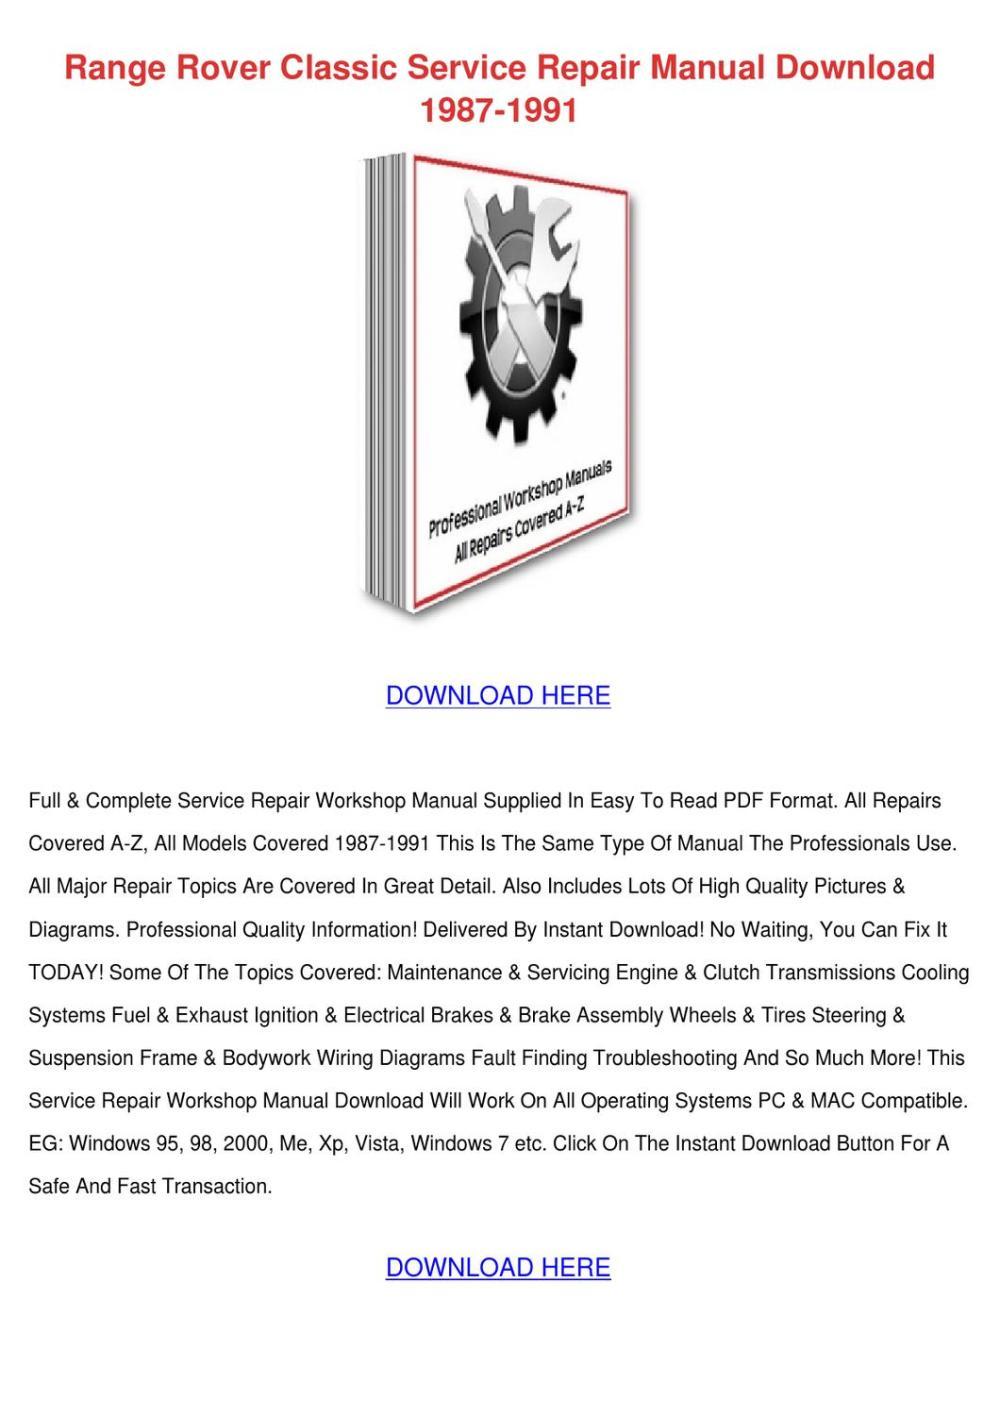 medium resolution of range rover classic service repair manual dow